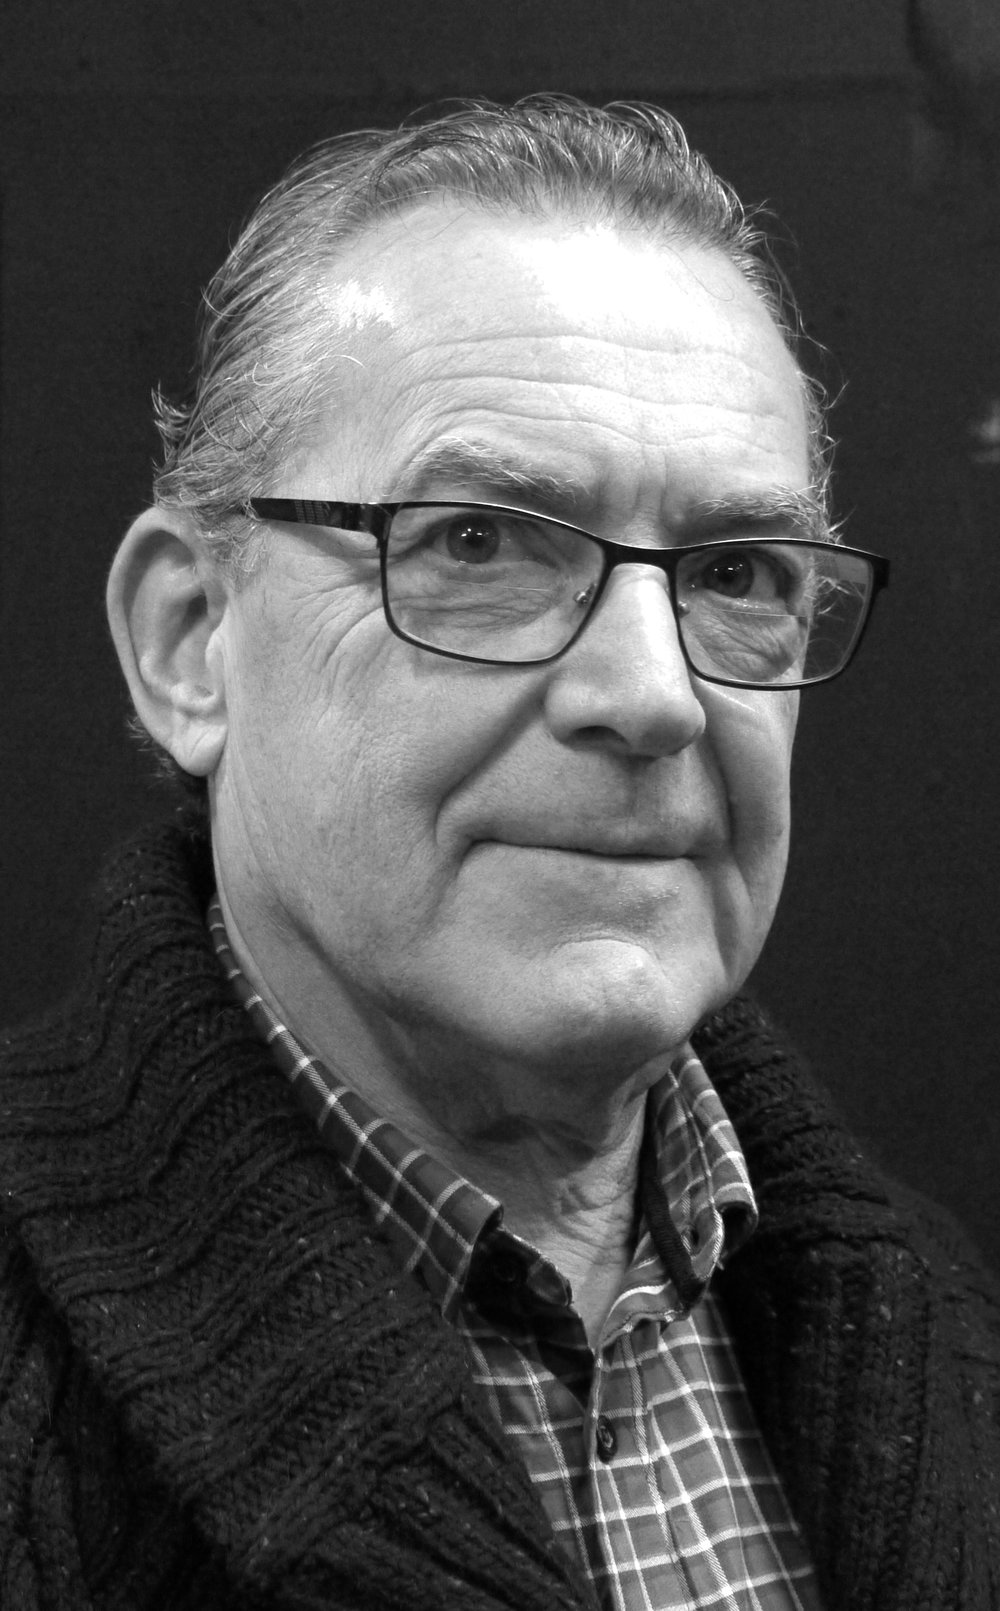 Peter Burkey